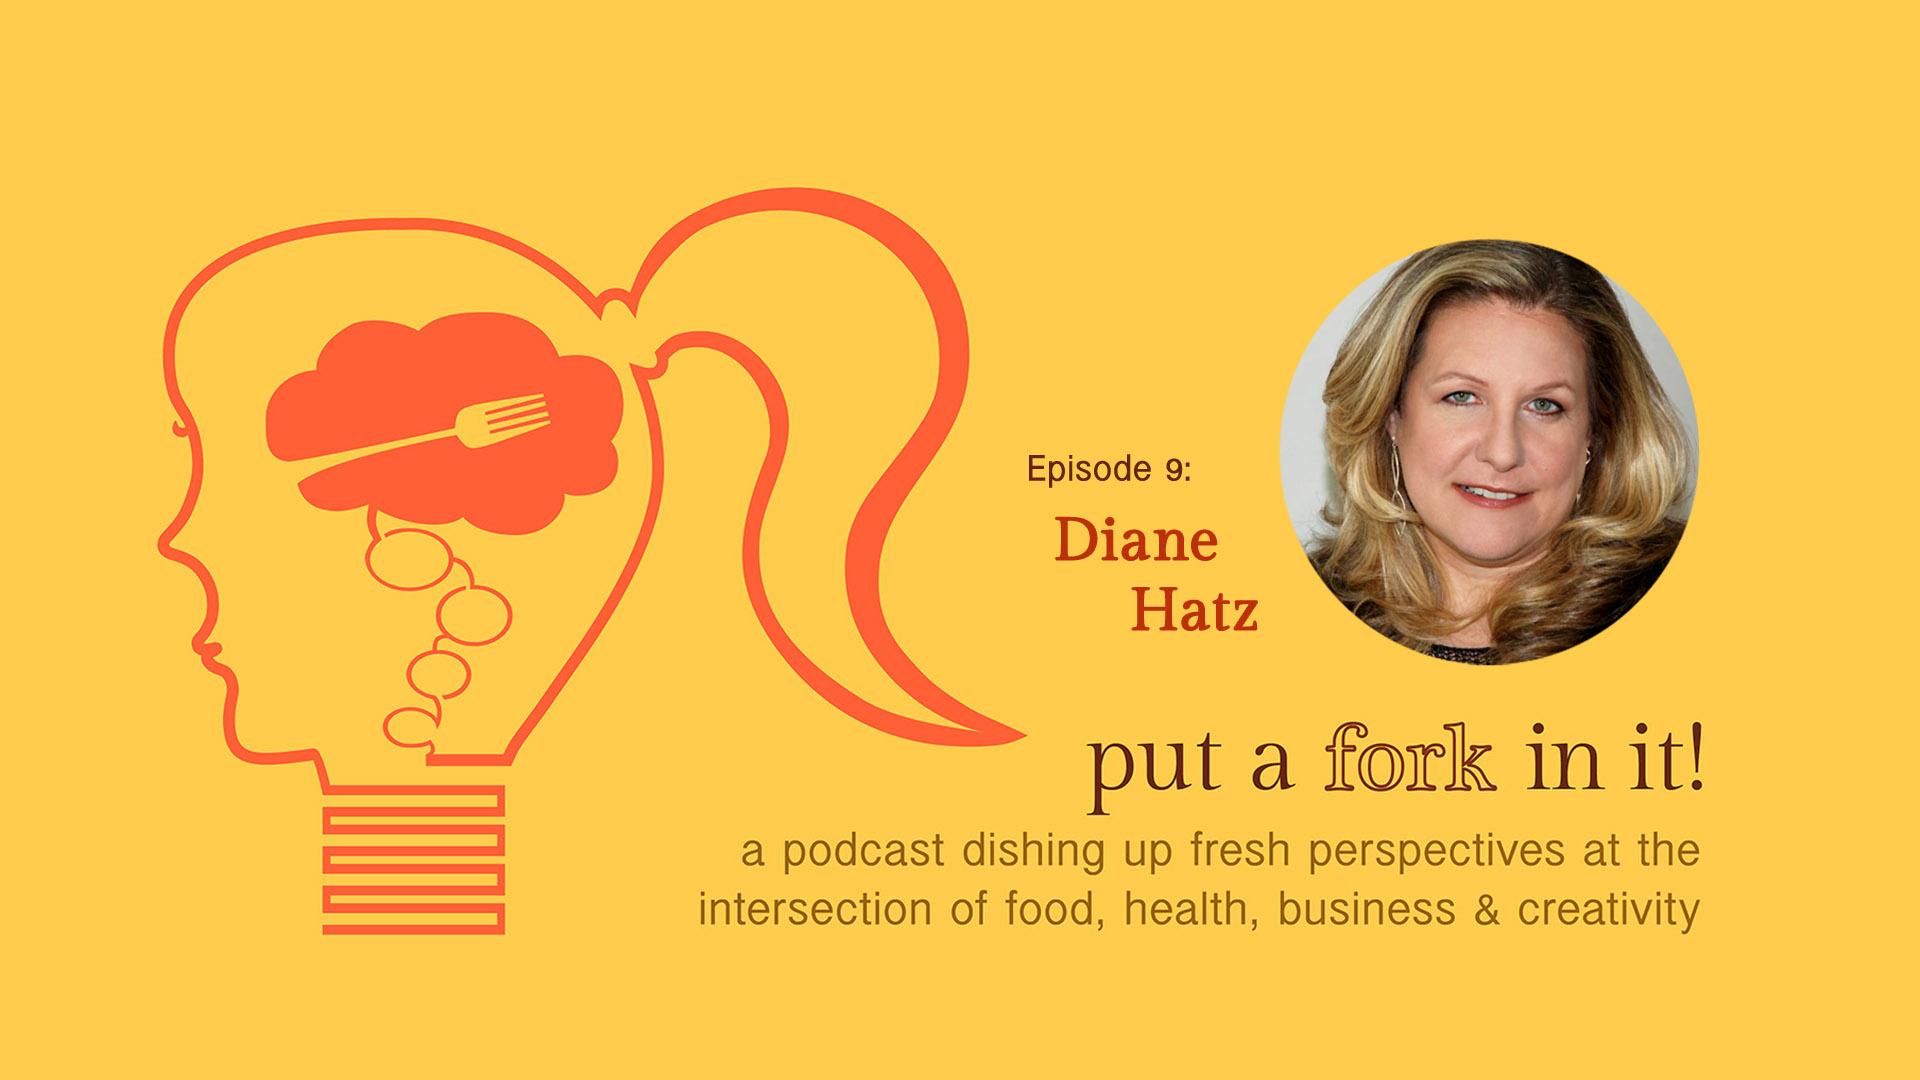 PAFII Episode 9: Diane Hatz, Founder & Executive Director of ChangeFood.org